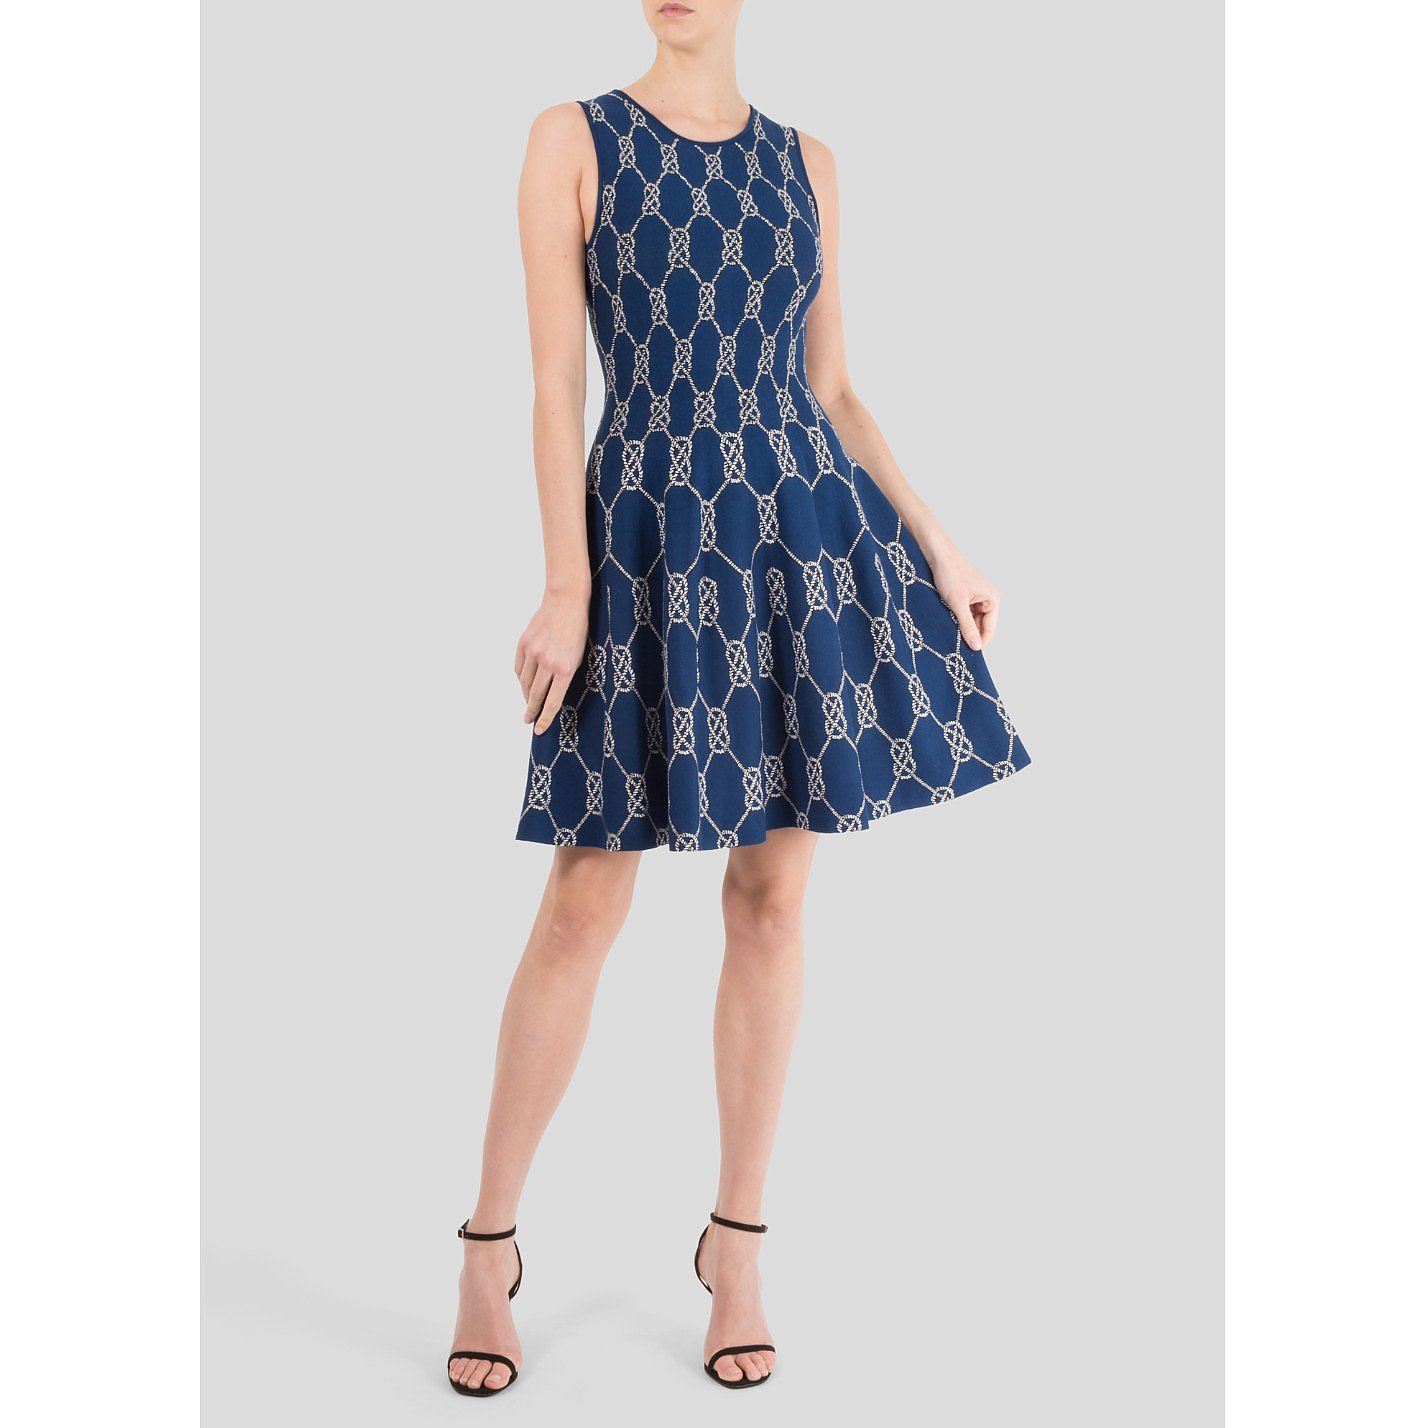 ISSA Chain Link Knit Dress